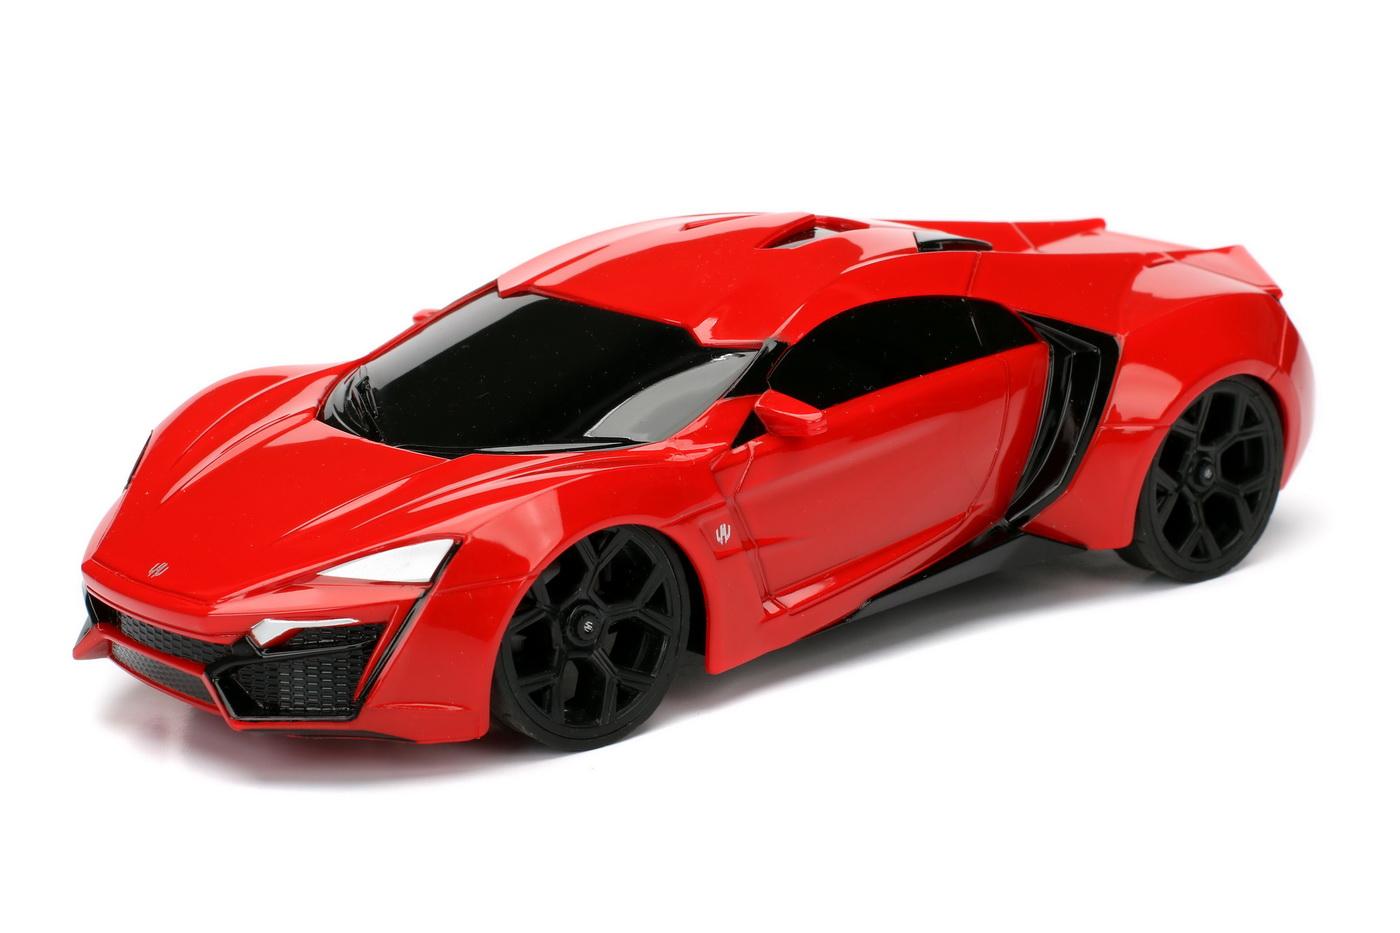 Masinuta Metalica Cu Telecomanda Fast Furious Rc Lykan Hypersport Scara 1:24